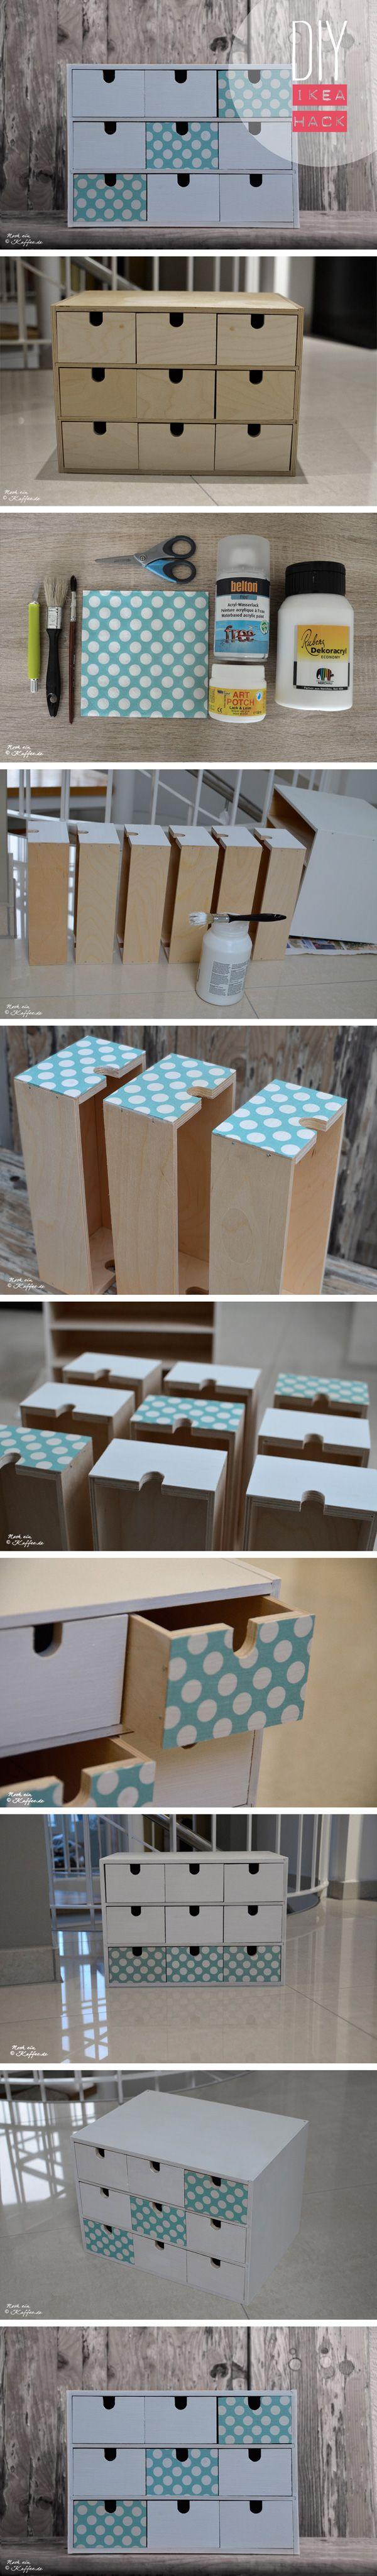 Diy ikea sewing table  DIY Ikea Hack Fira Minikommode IKEA HACK EIN NEUER PLATZ FÜR ALLE